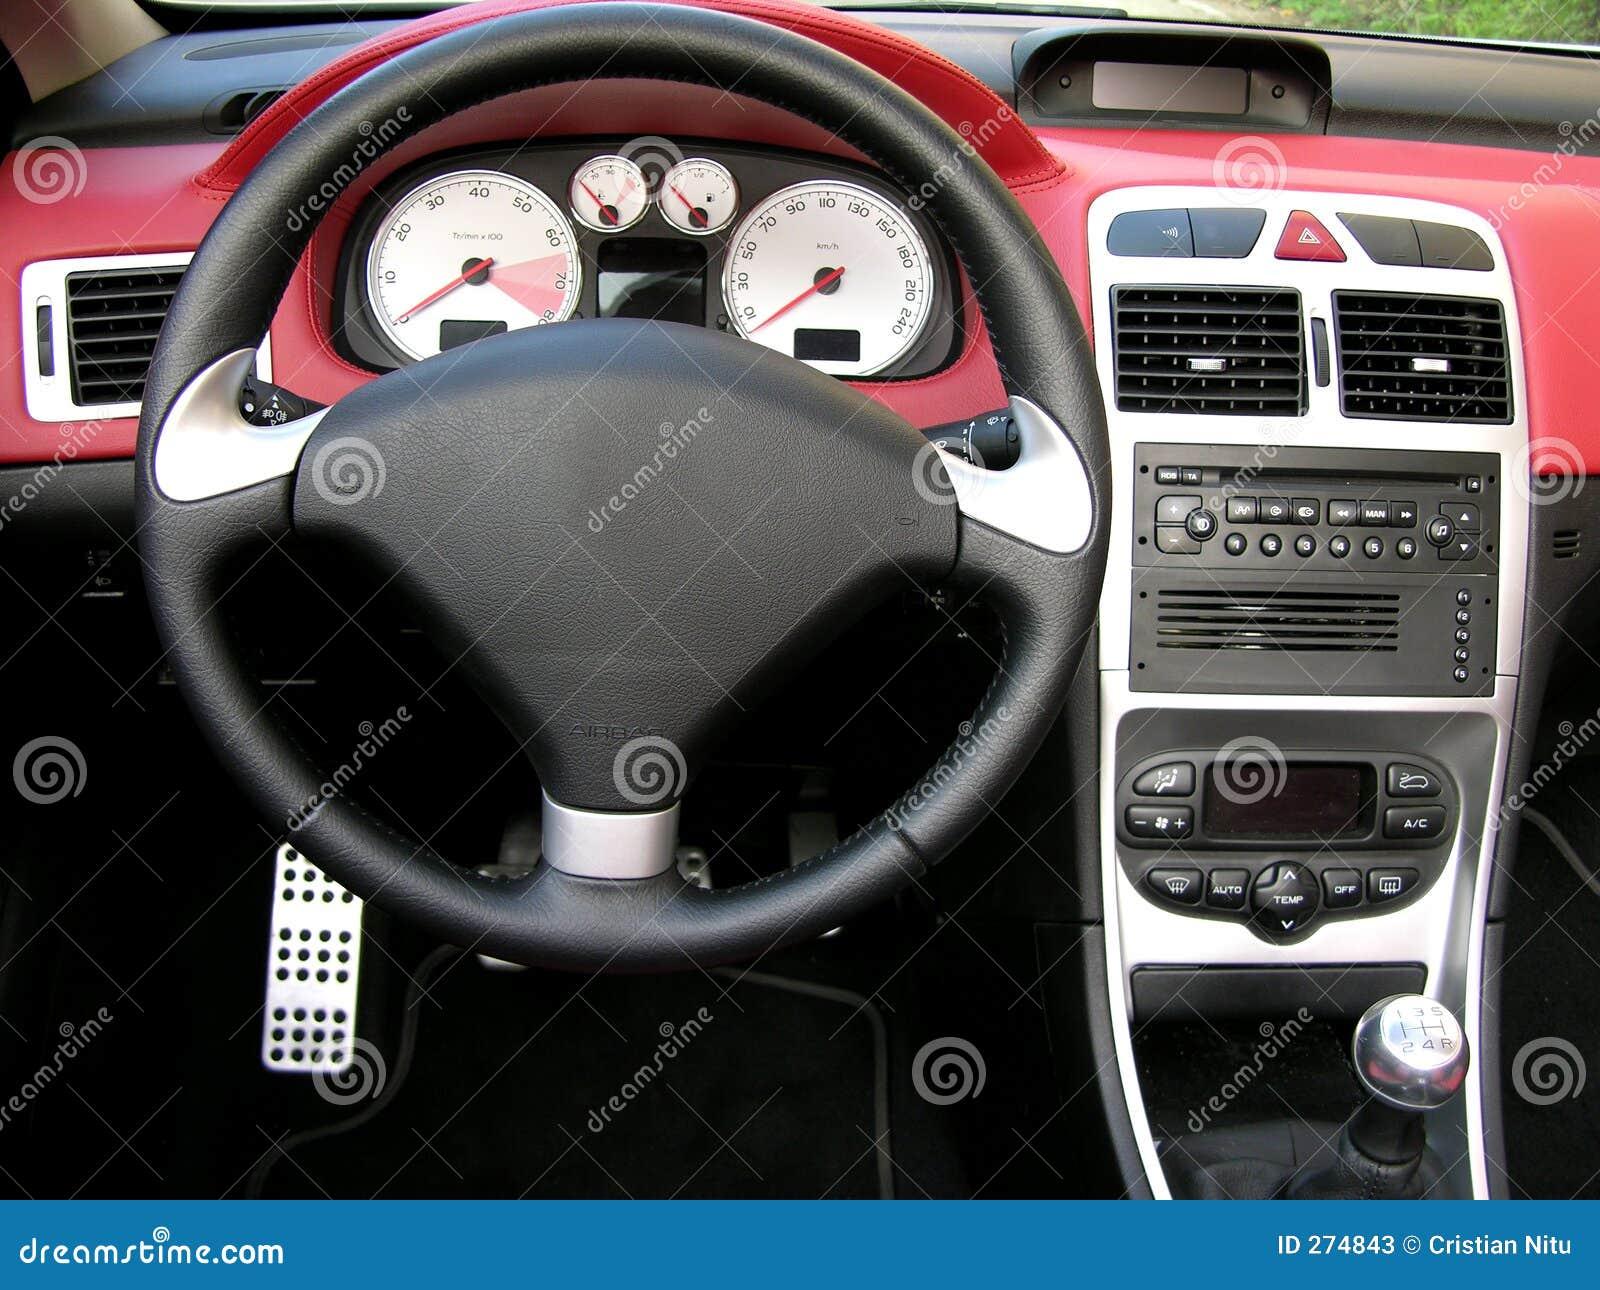 car interior stock photos image 274843. Black Bedroom Furniture Sets. Home Design Ideas